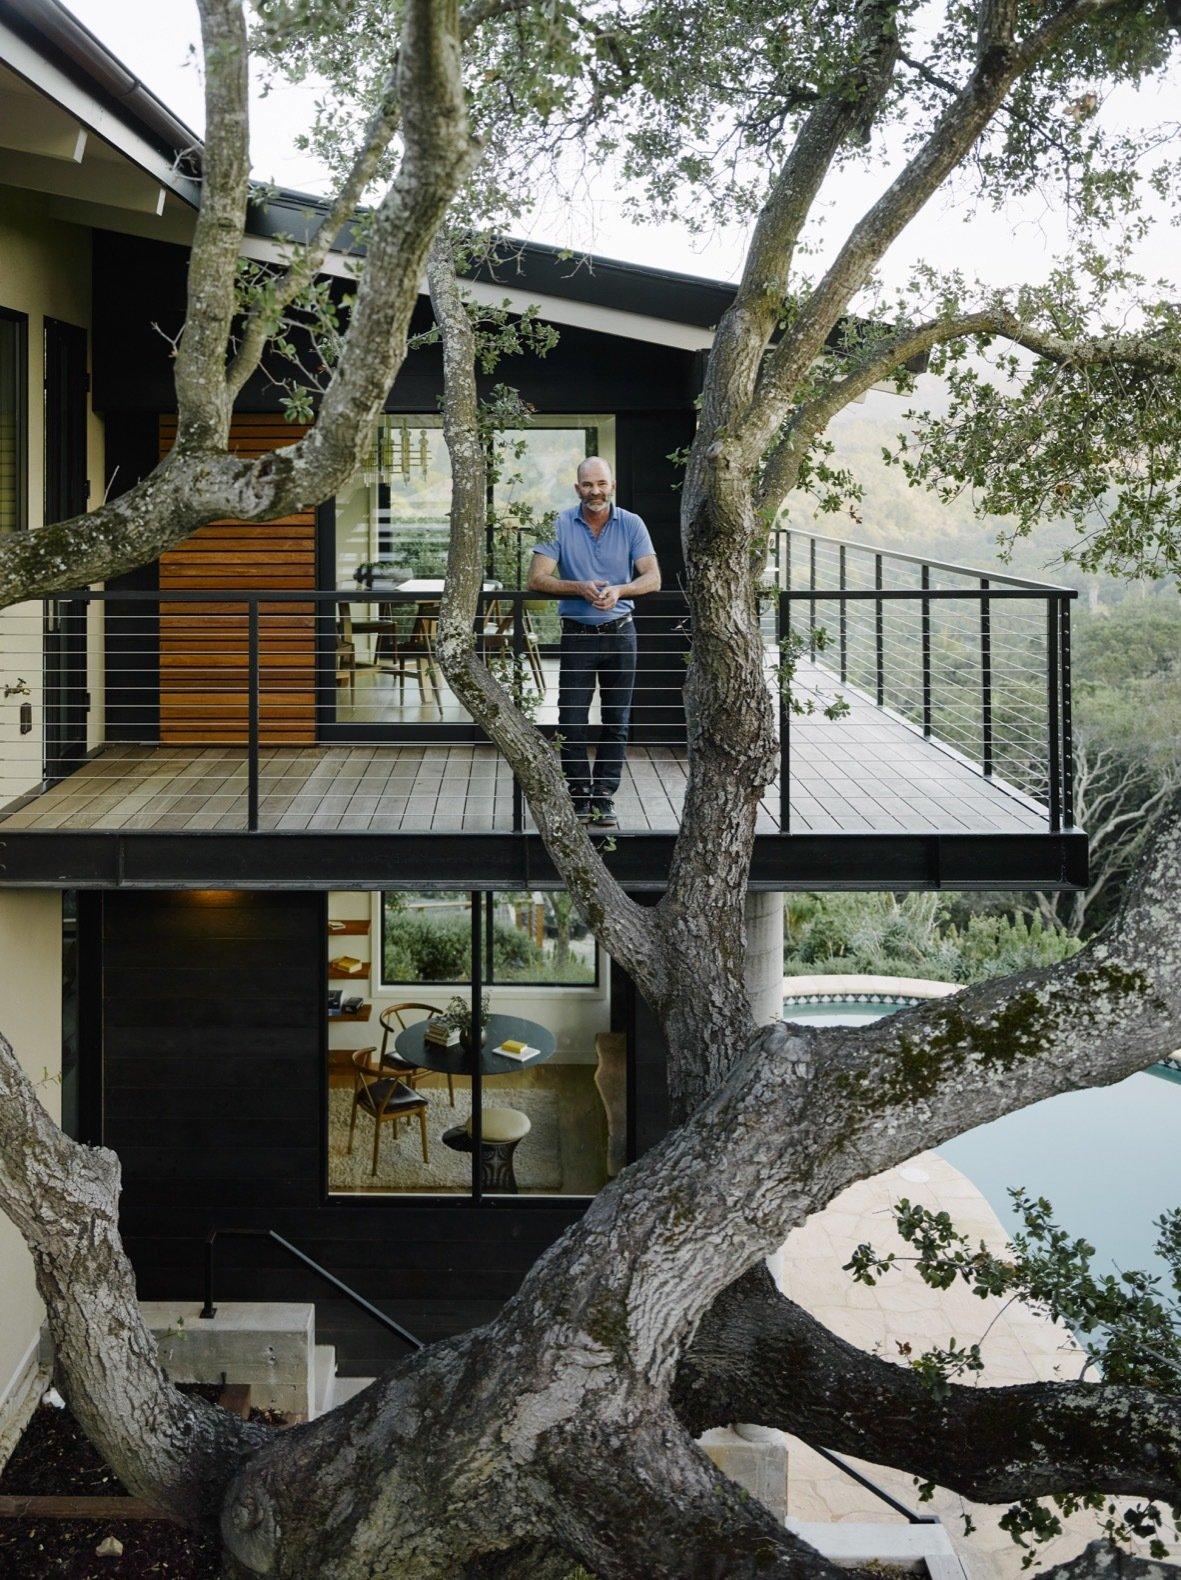 Malcolm Davis at the Portola Valley House